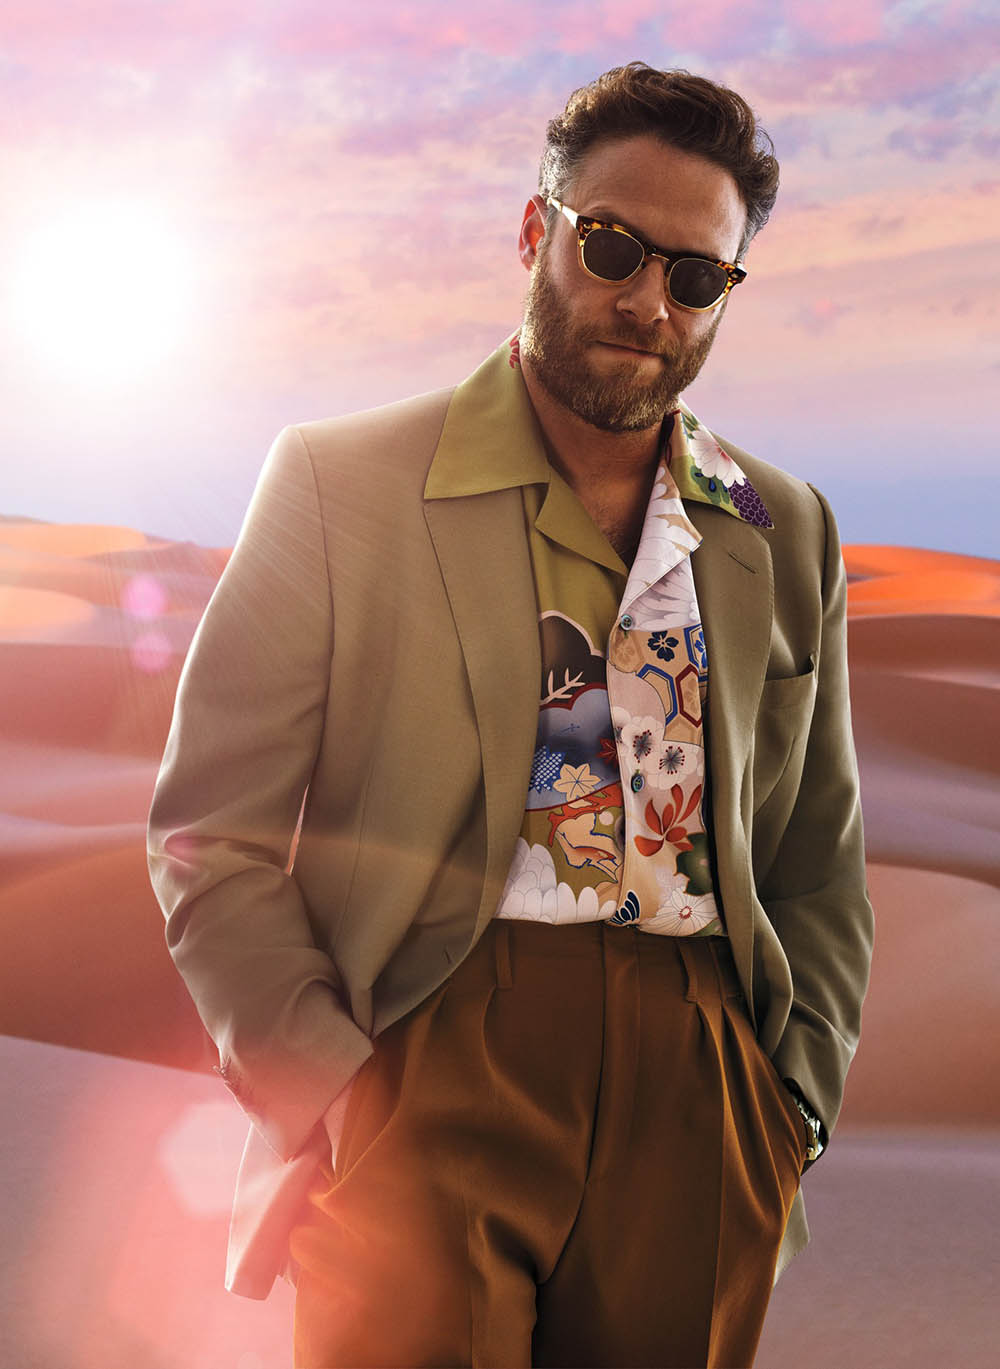 Seth Rogen covers GQ USA June July 2019 by Sebastian Mader